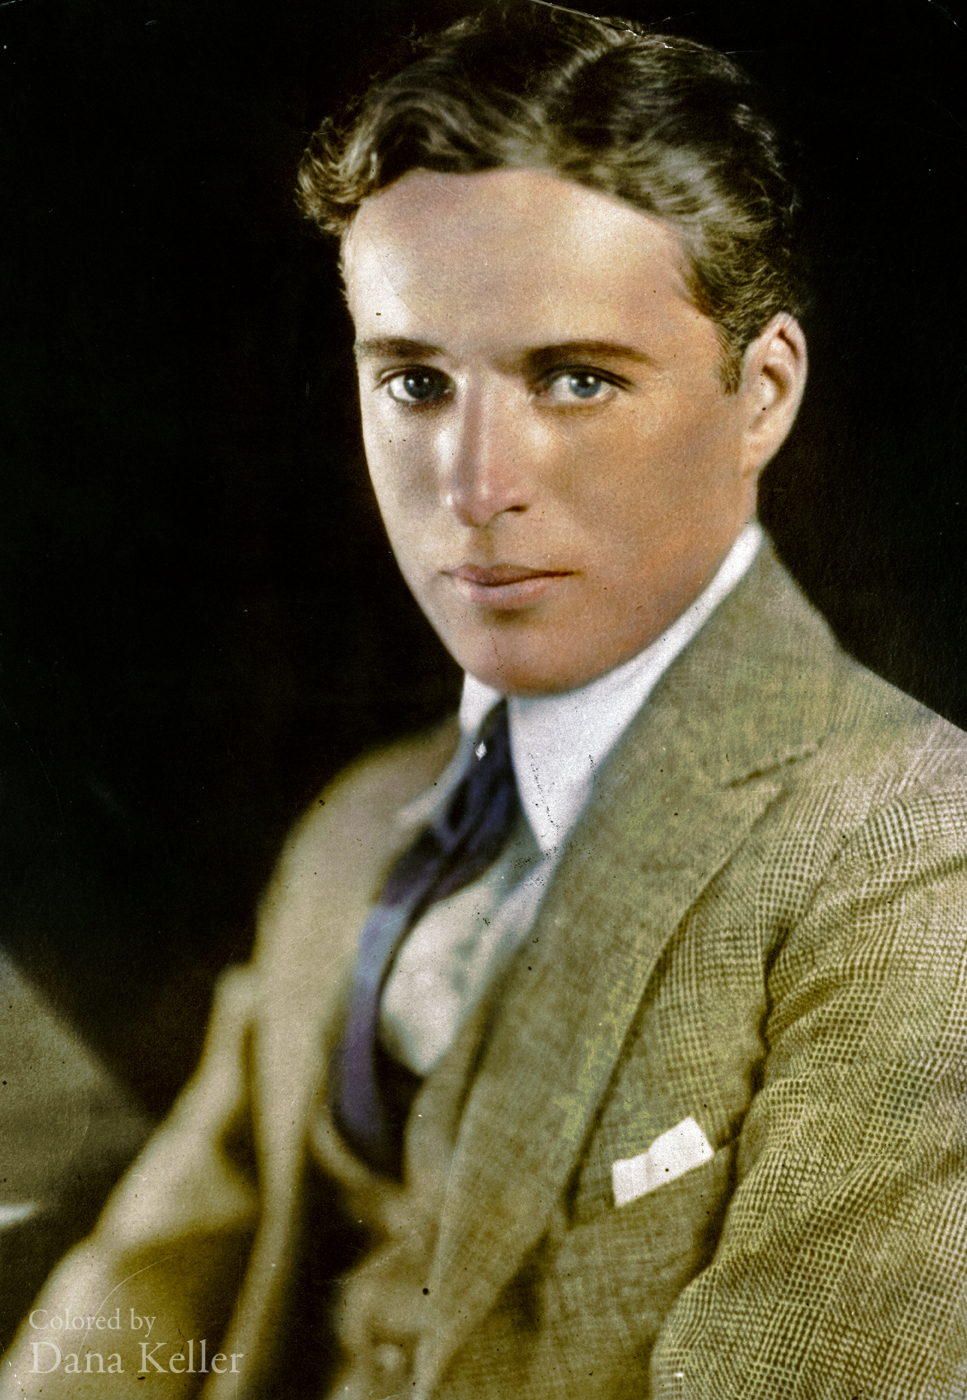 1920s Men S Fashion: History In Color